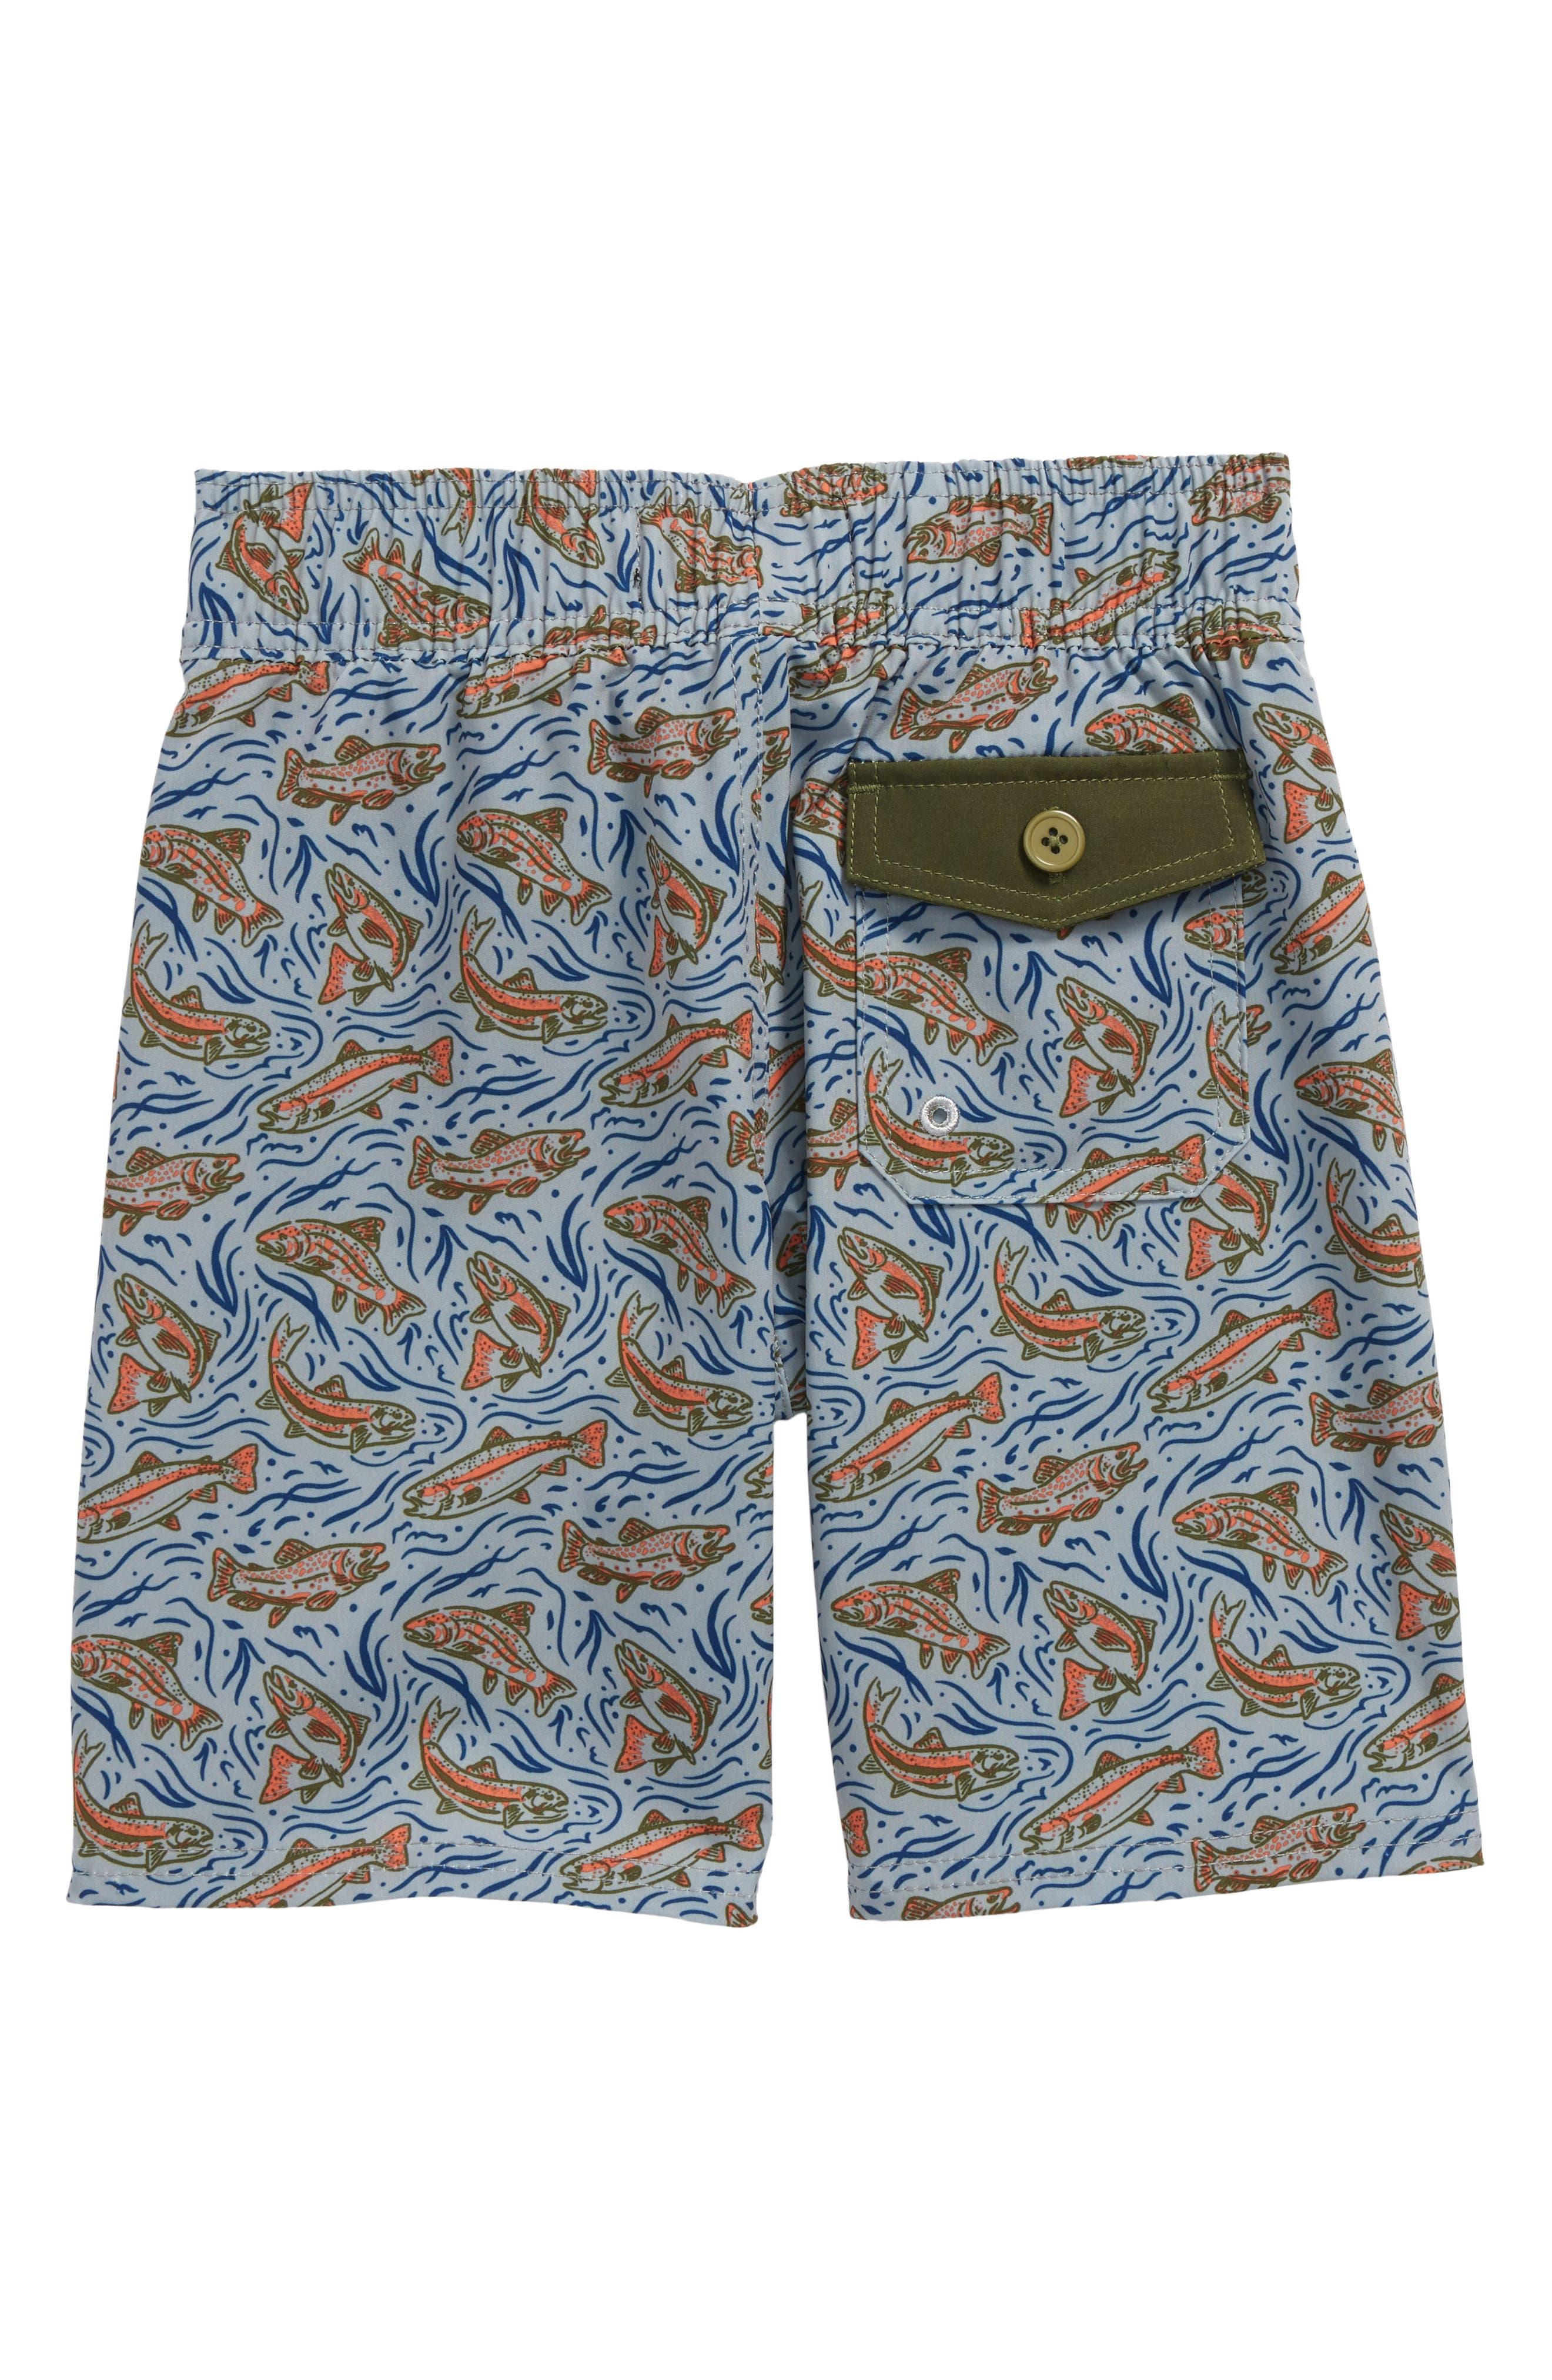 Alternate Image 2  - United By Blue Upstream Board Shorts (Little Boys & Big Boys)